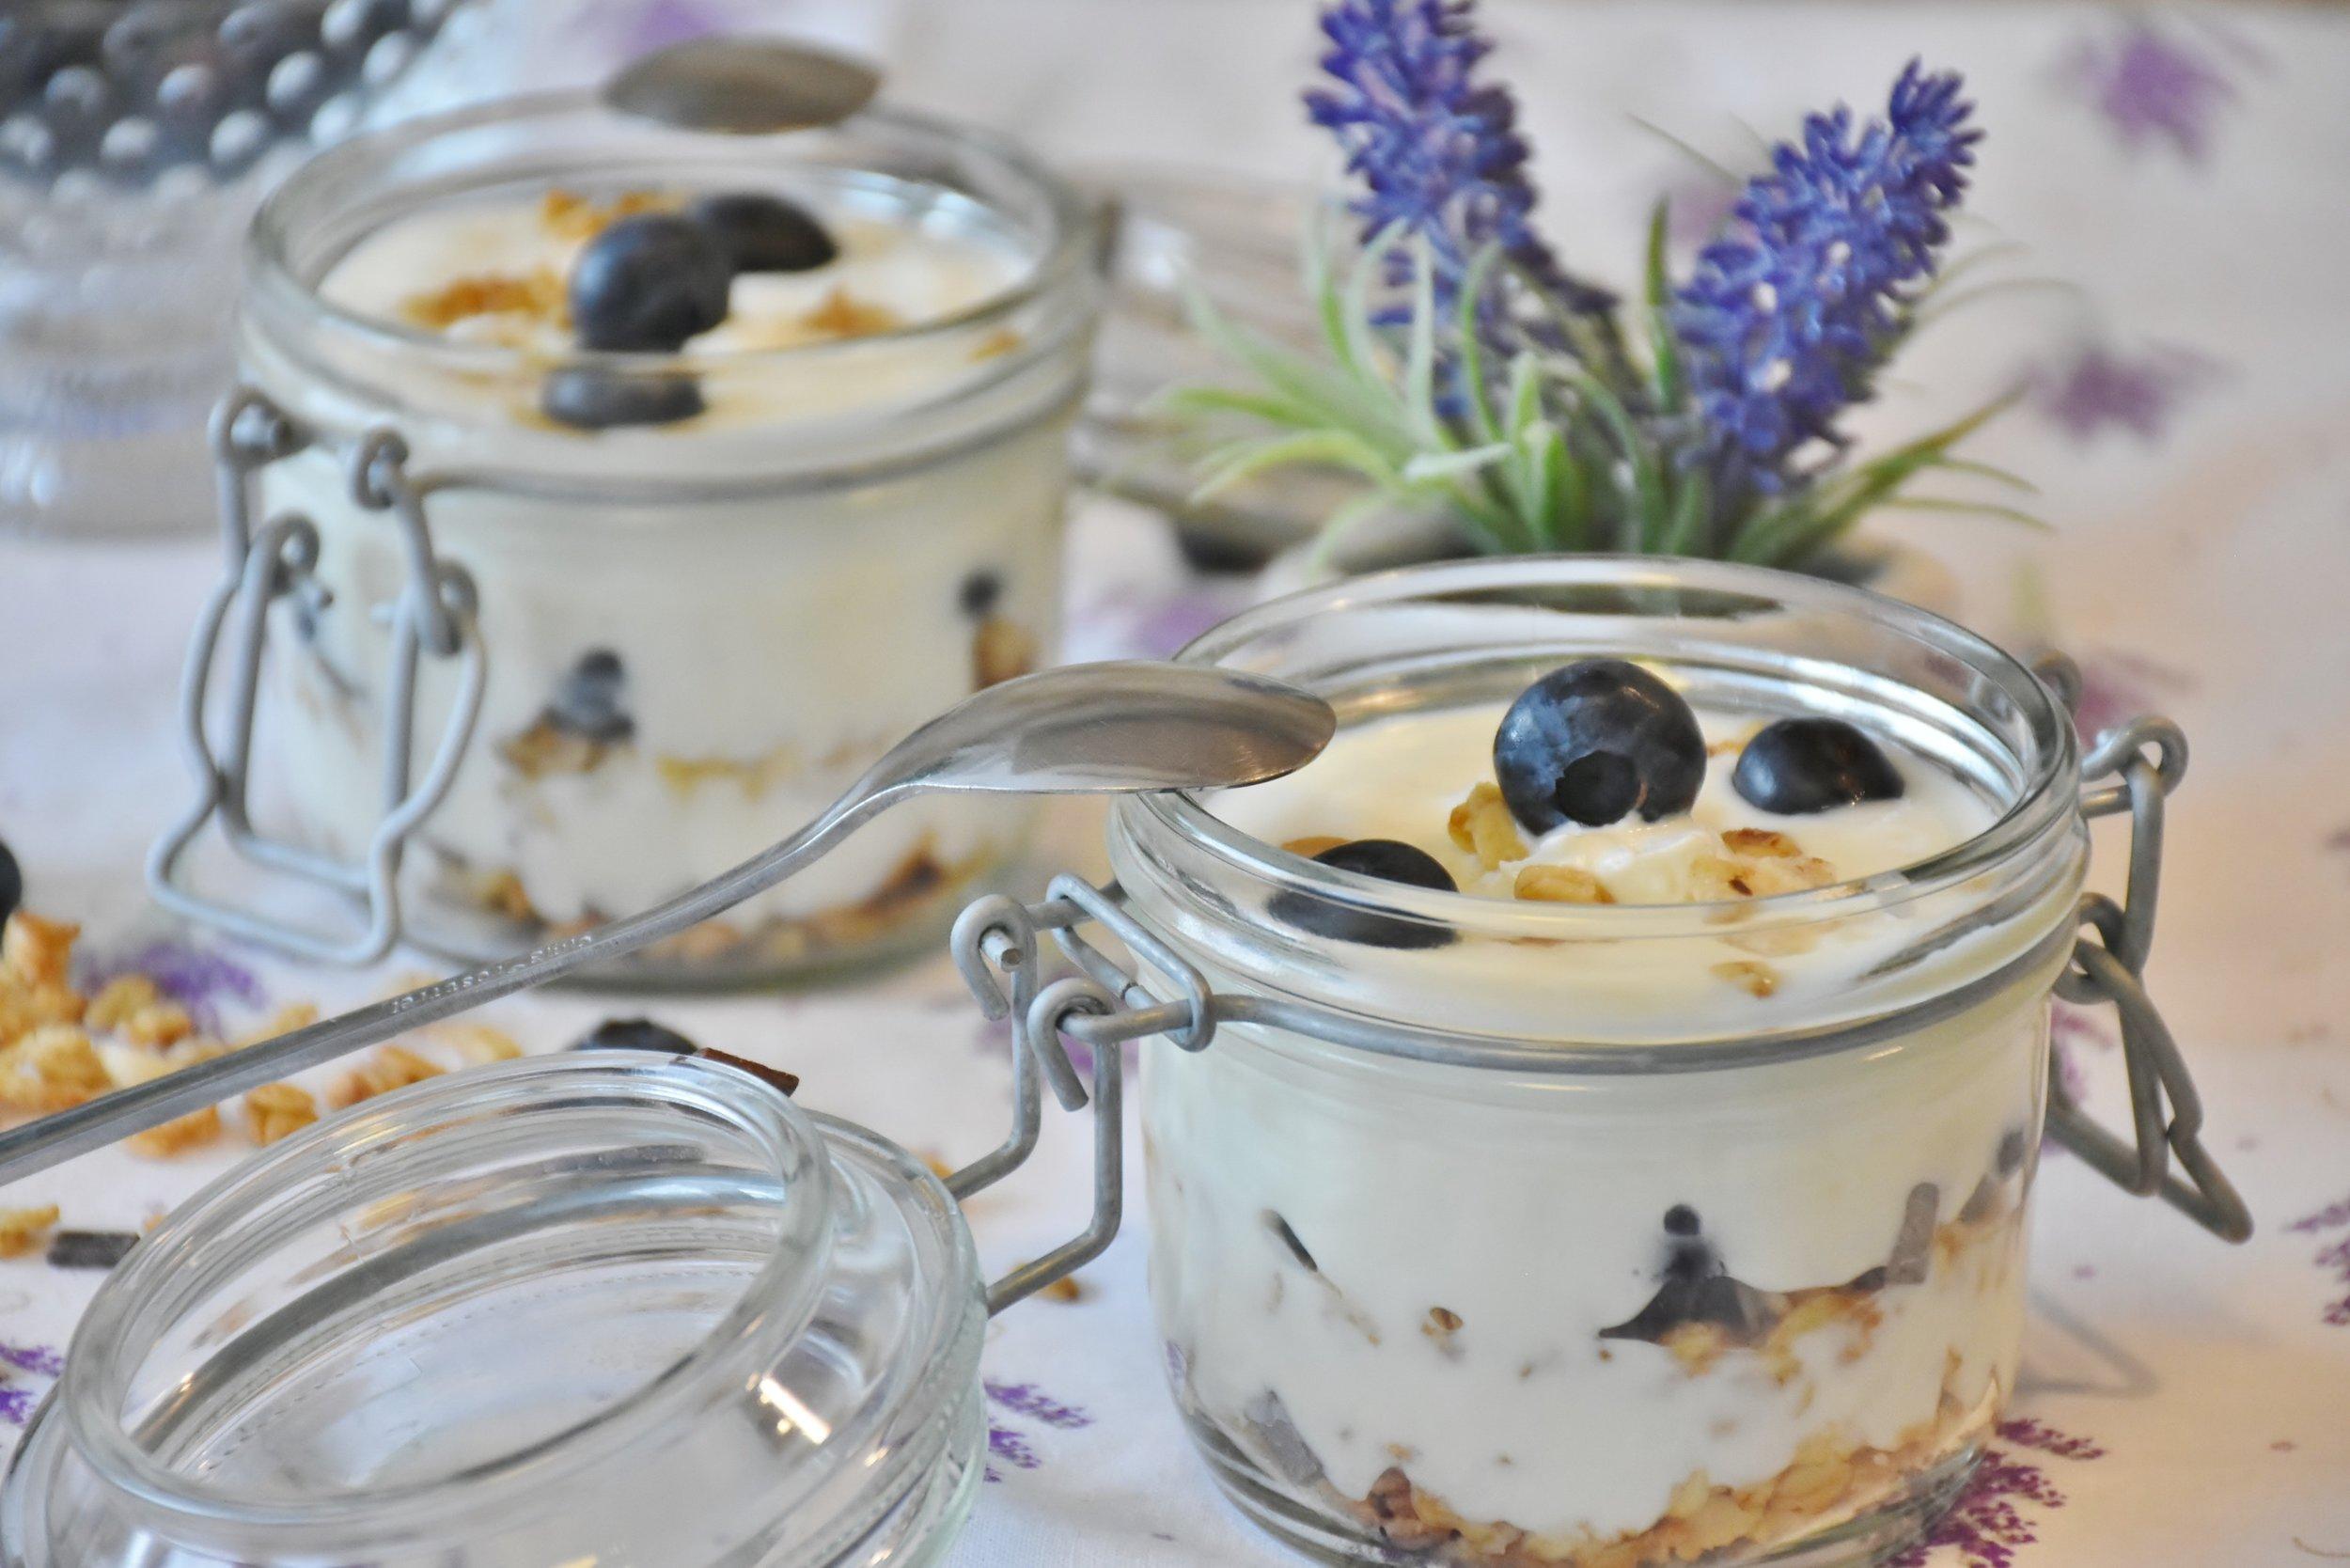 blueberries-bowl-breakfast-209460.jpg